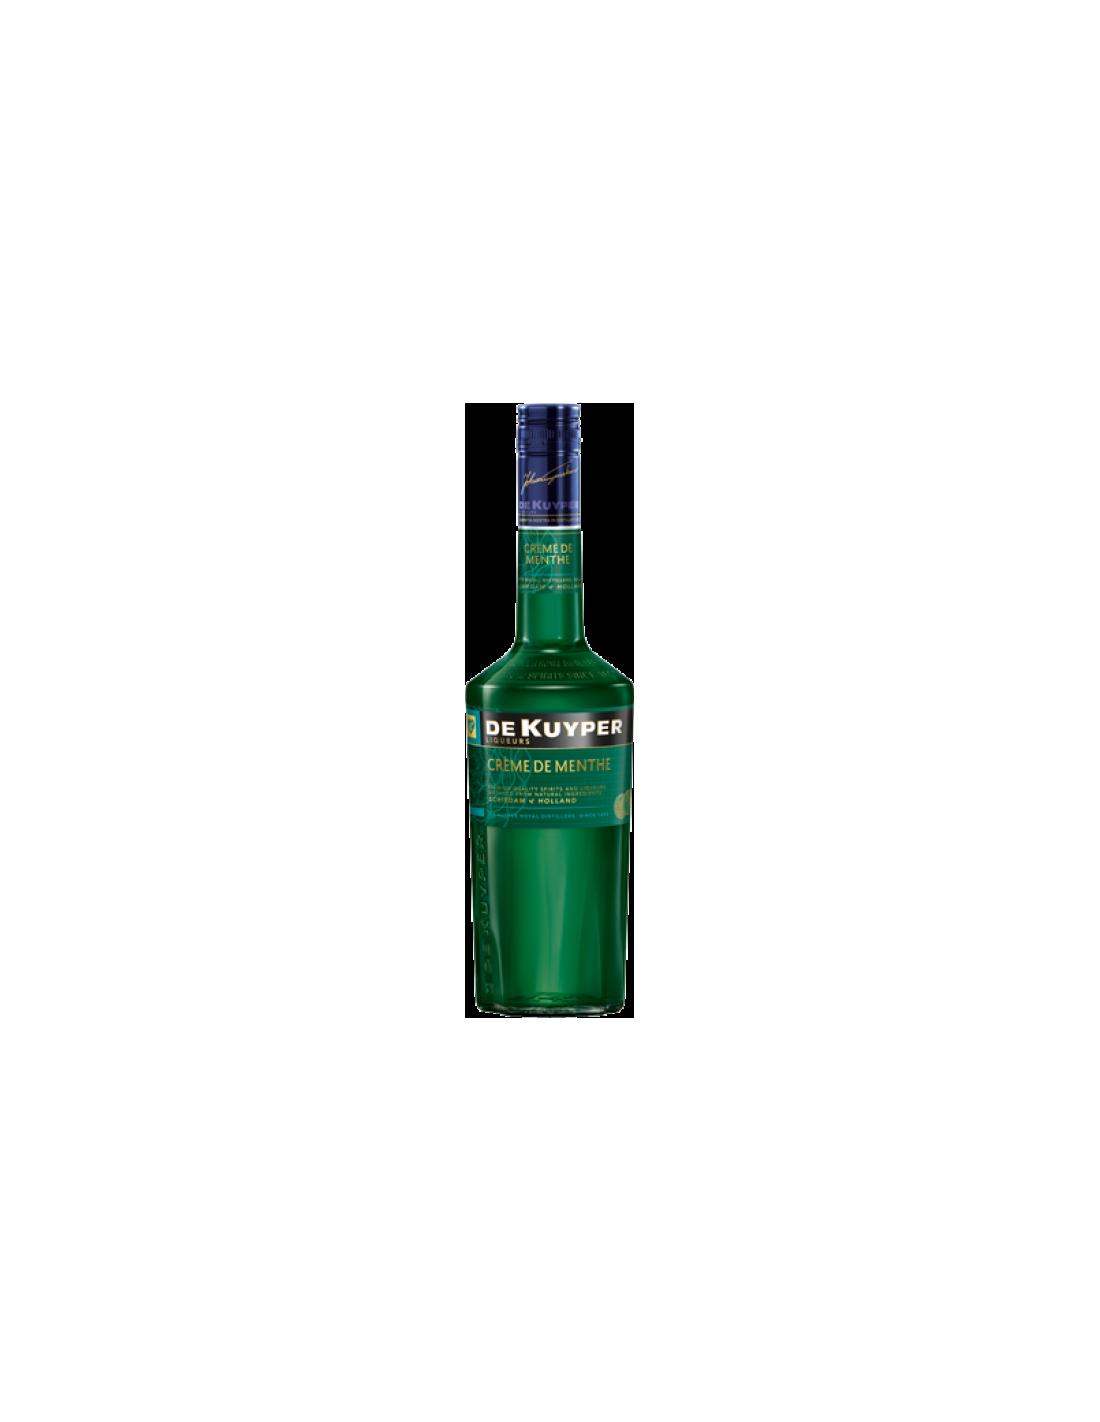 Lichior De Kuyper Creme de Menthe, 24% alc., 0.7L, Olanda